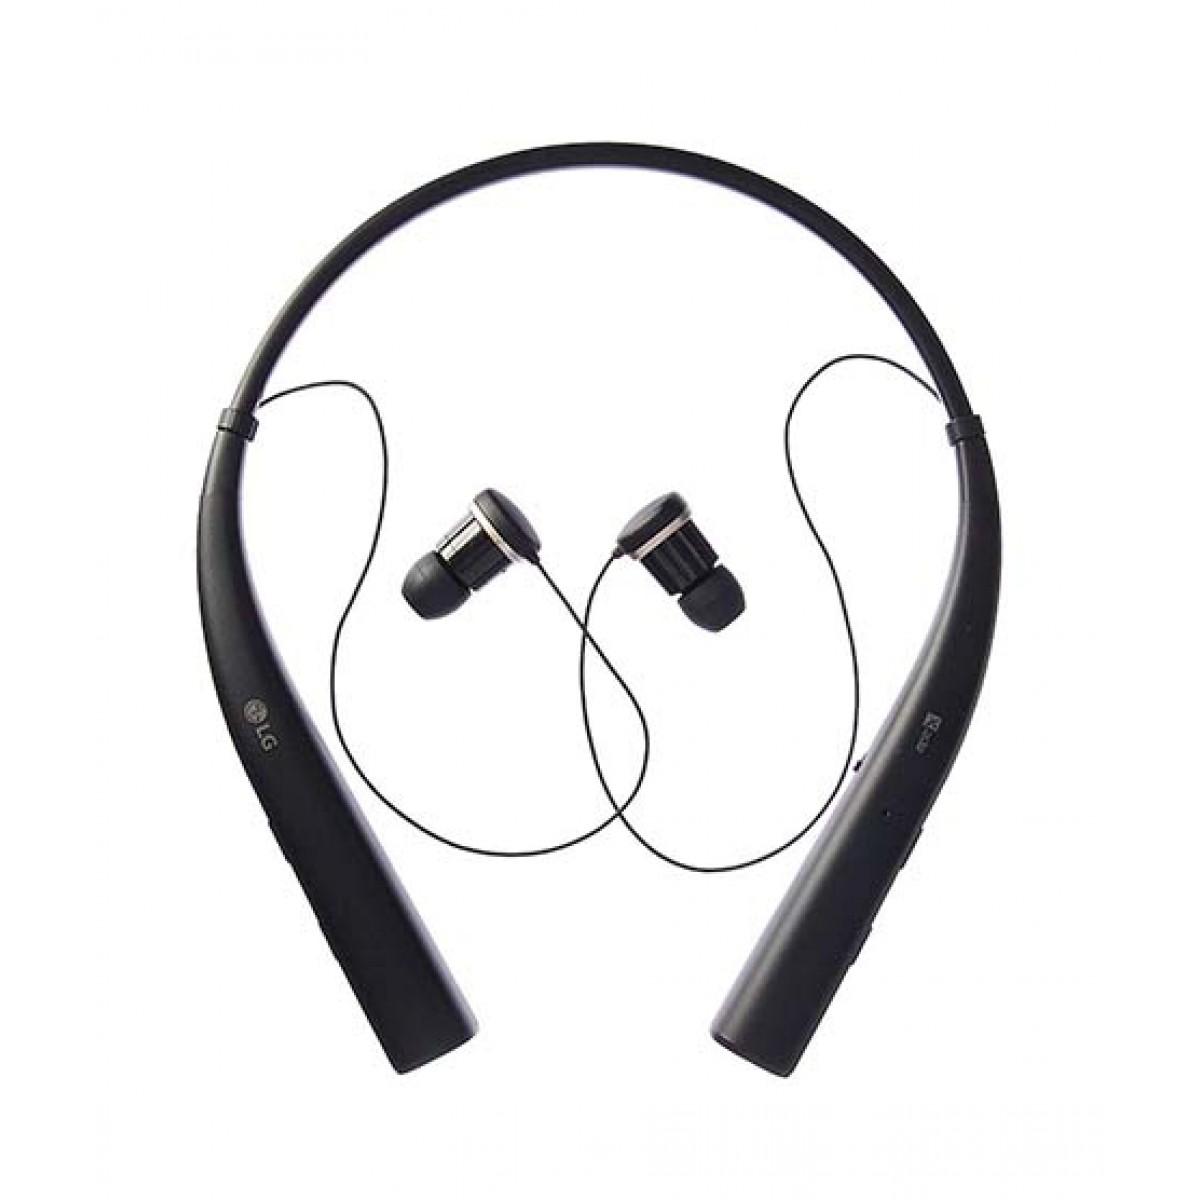 Lg Tone Pro Wireless Stereo Headset Price In Pakistan Buy Lg Tone Pro Headset Black Hbs 780 Ishopping Pk